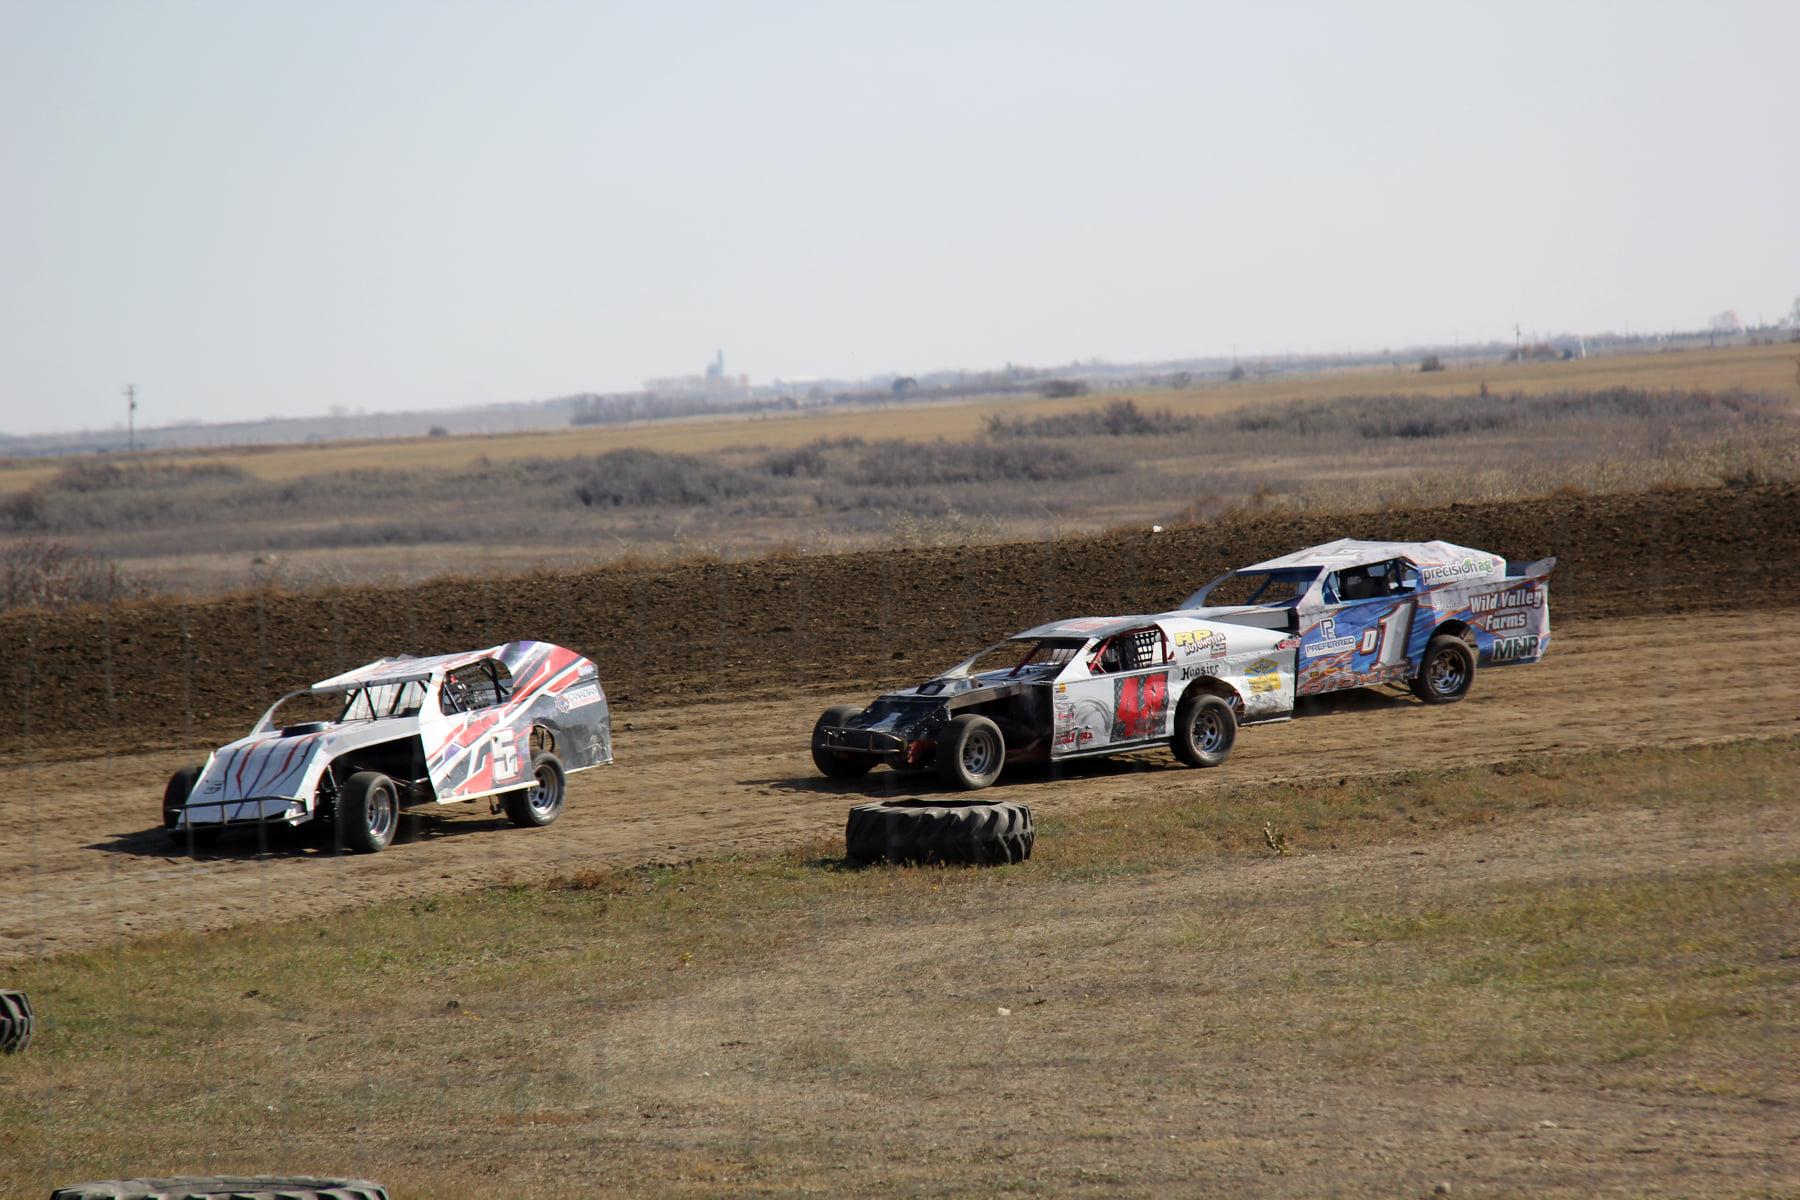 Outlook_Racing_Kemmer_Racing_Photography_14.jpg